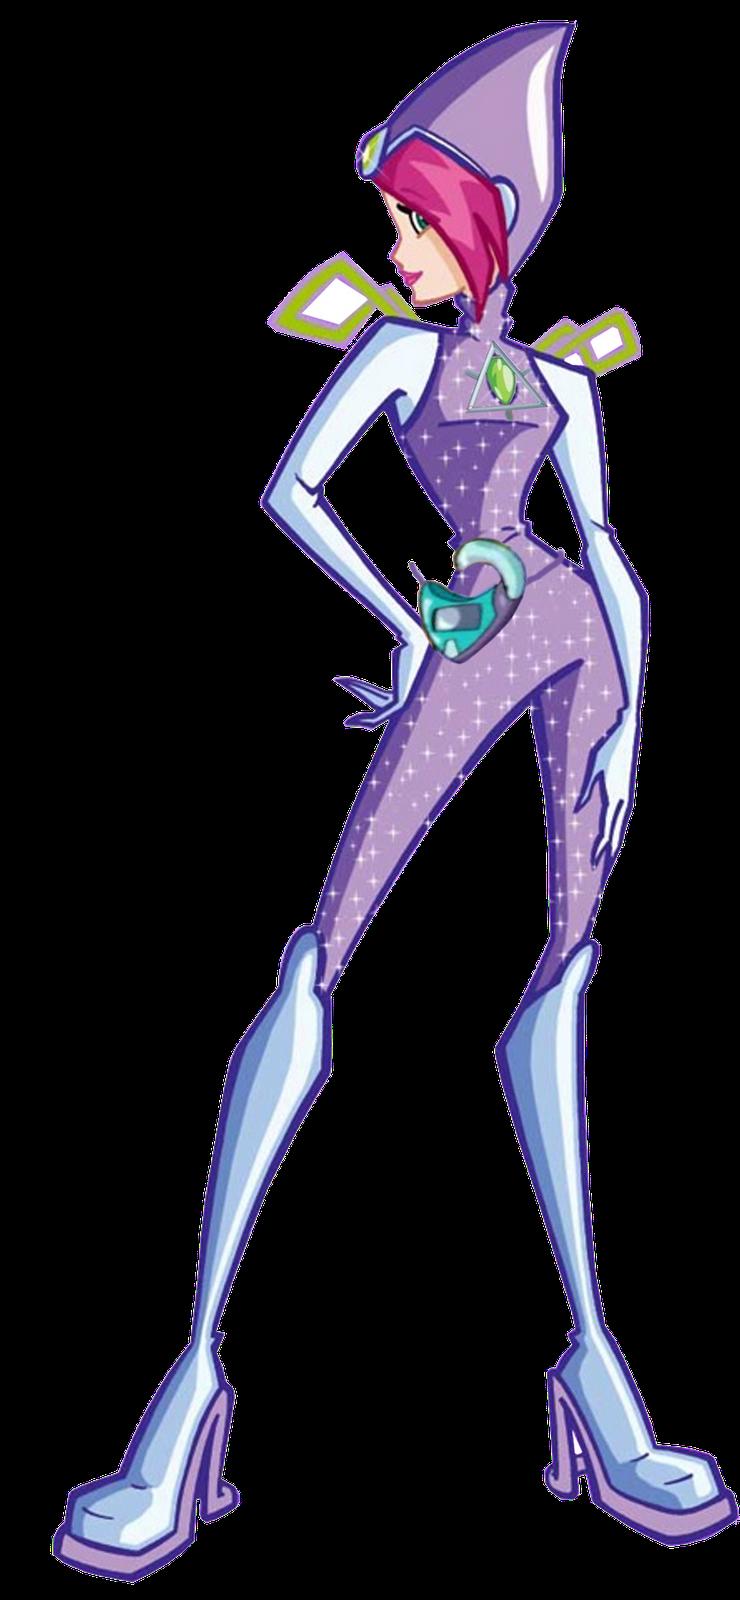 Image winx fairies tecna wiki winx - Jeux de winx musa ...